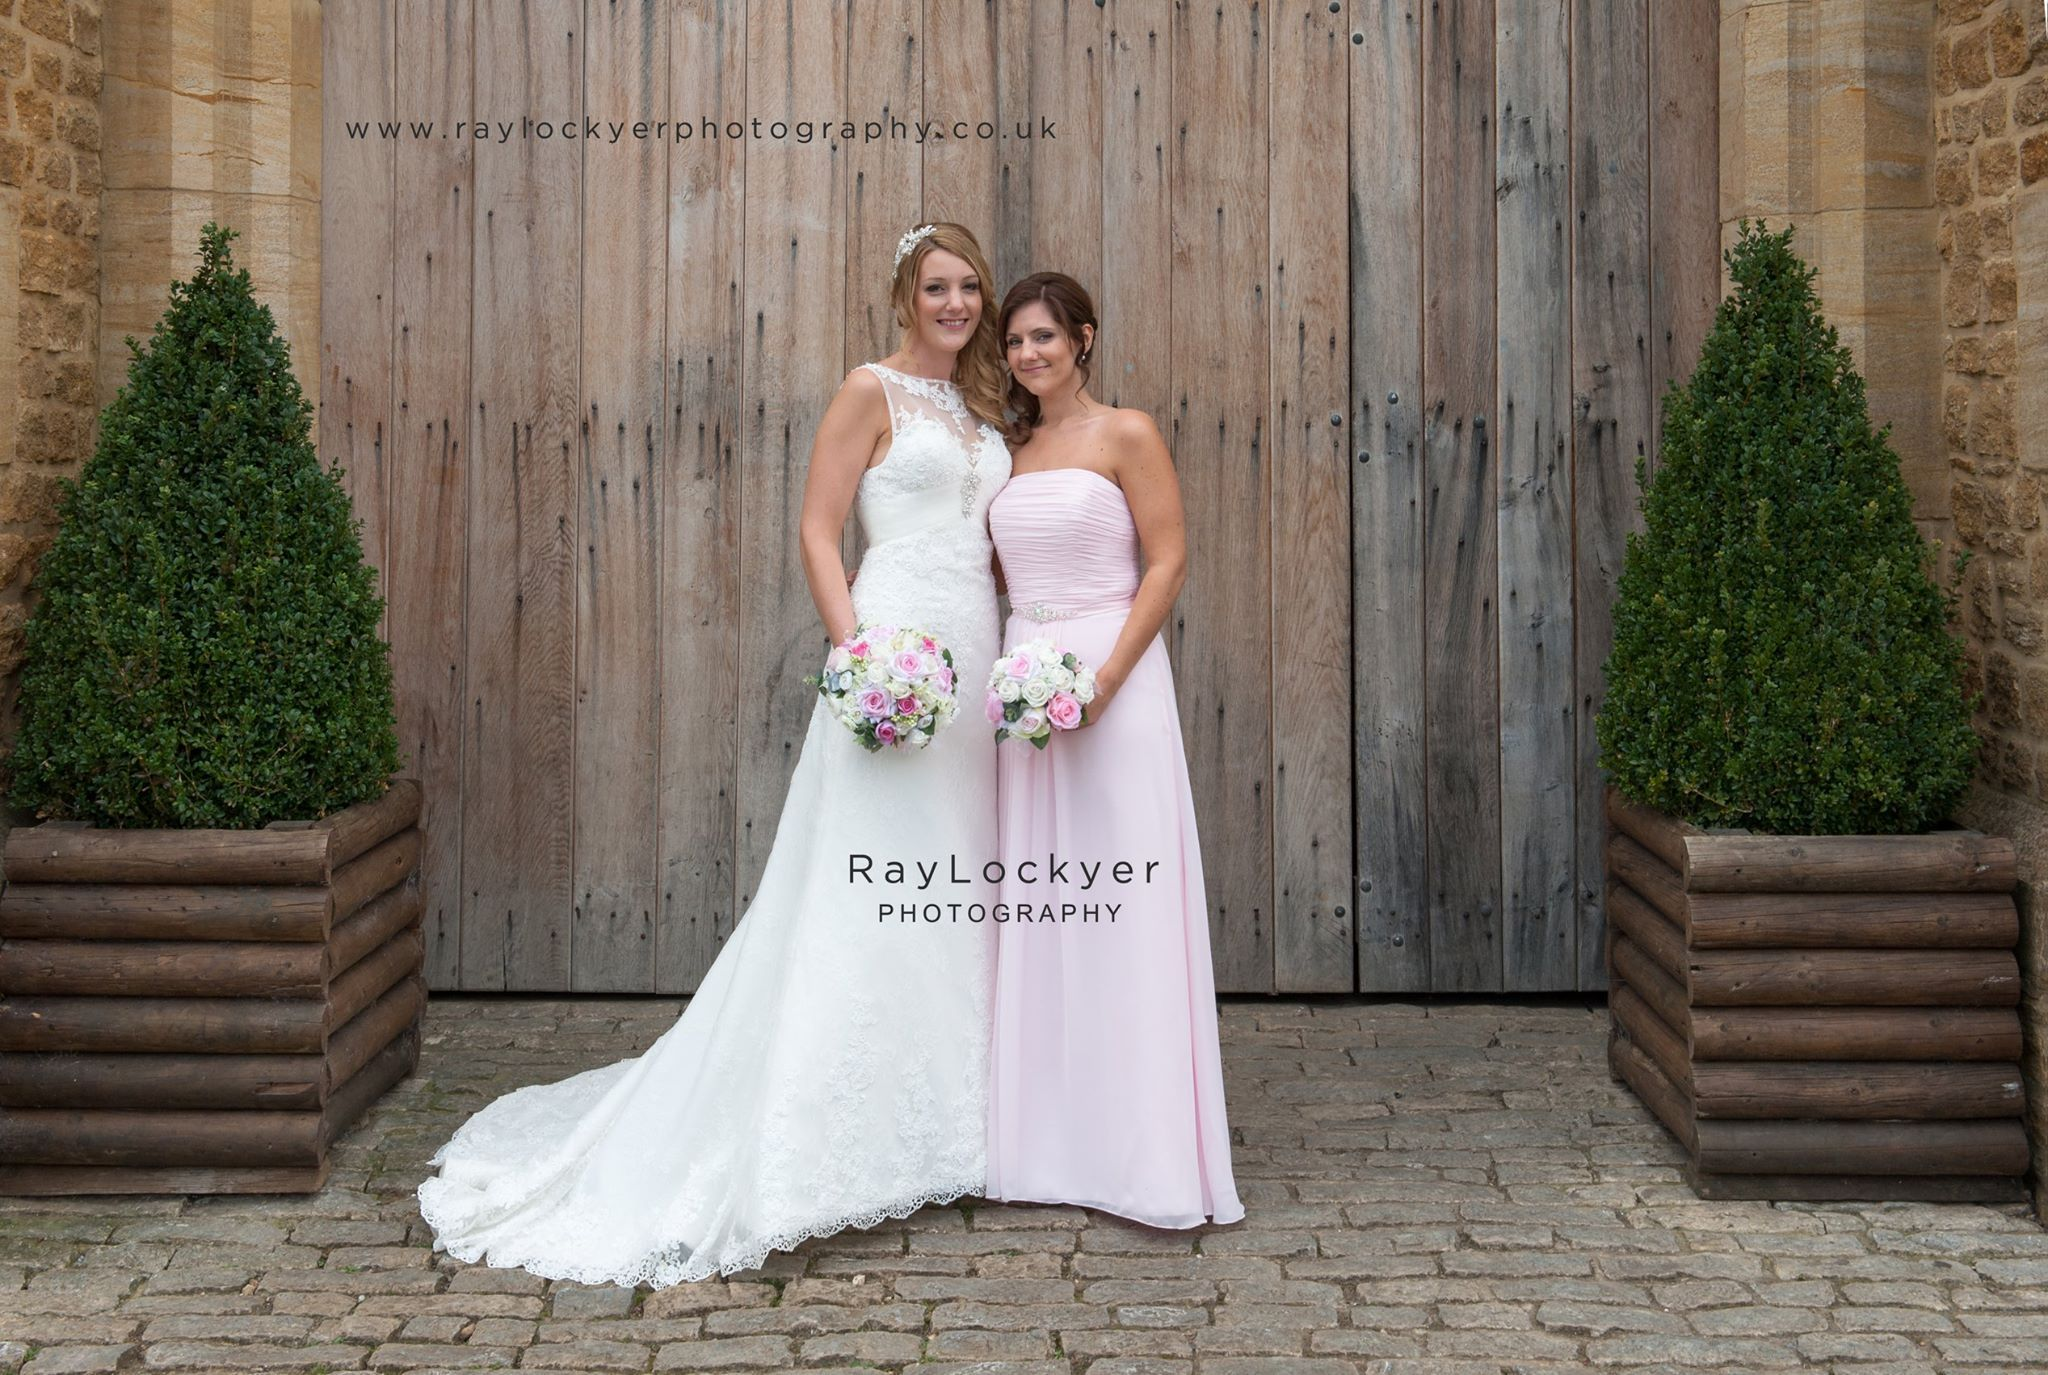 Ray Lockyer Yeovil Wedding Photographer - Bride and her Chief ...